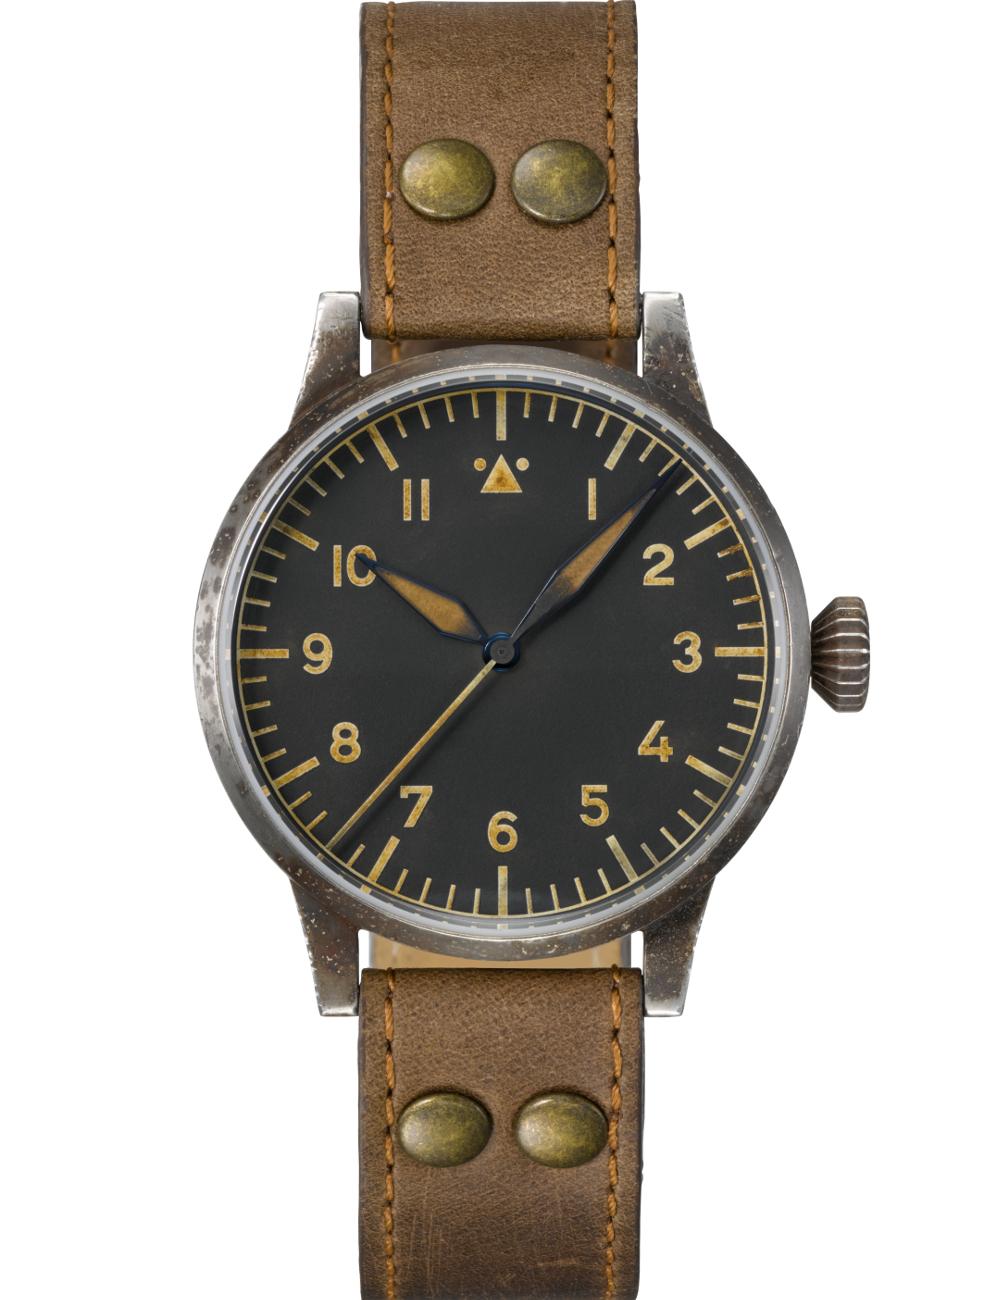 Laco Erbstuck Baumuster A Mulheim An Der Ruhr Uhren Kock Mechanische Uhren Online Kaufen